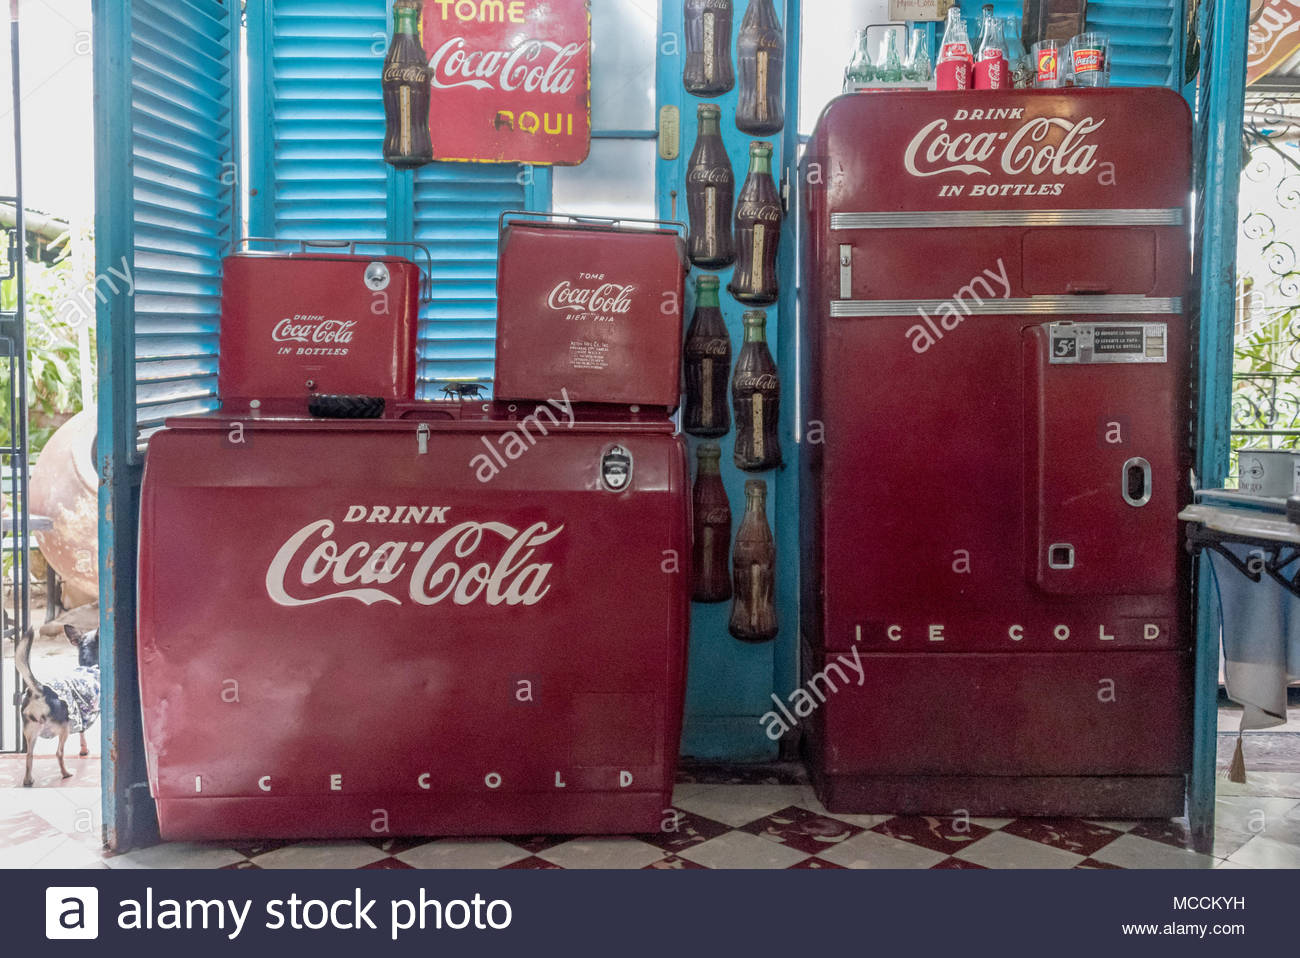 Kühlschrank Coca Cola : Coca cola kühlschrank in basel kaufen tutti